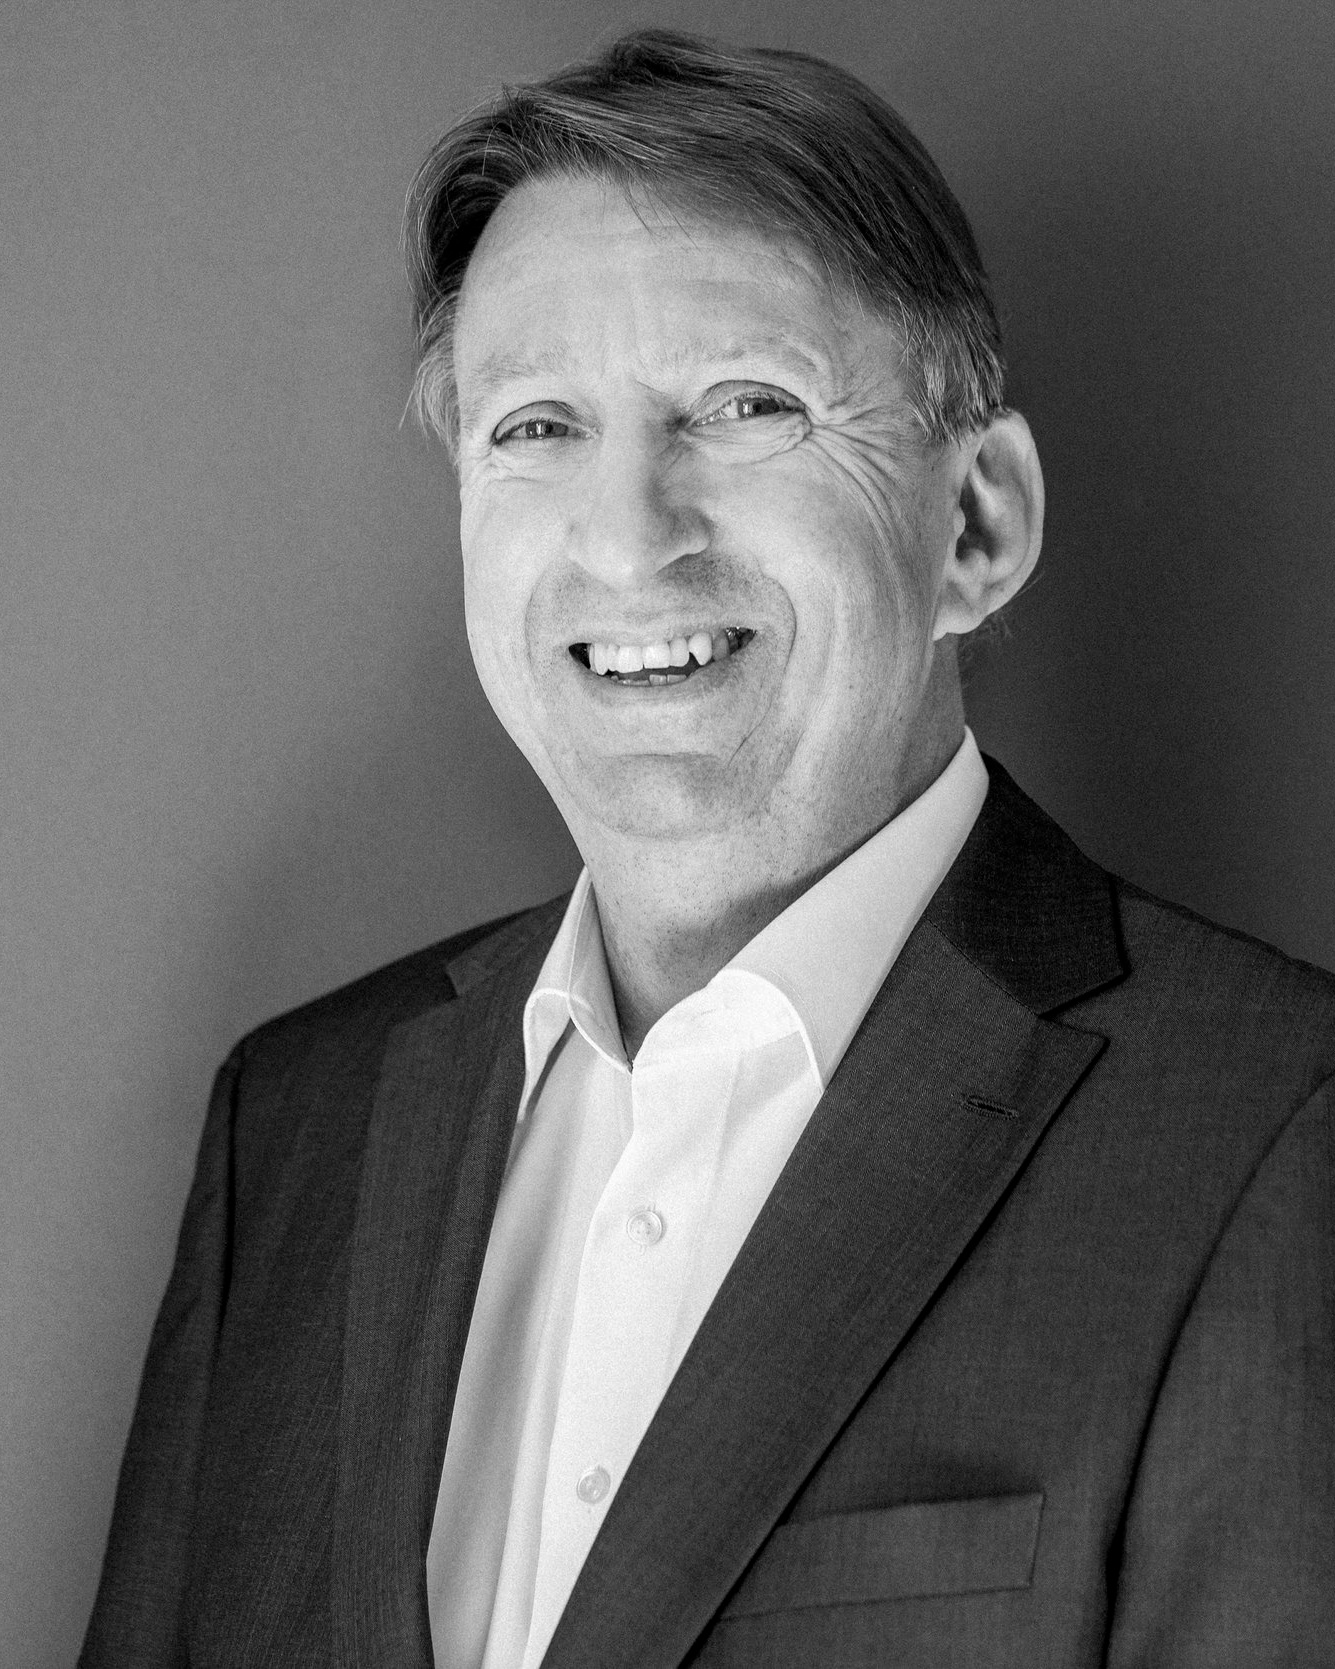 Tony Perkins   Senior Berater  Fokus: Business English